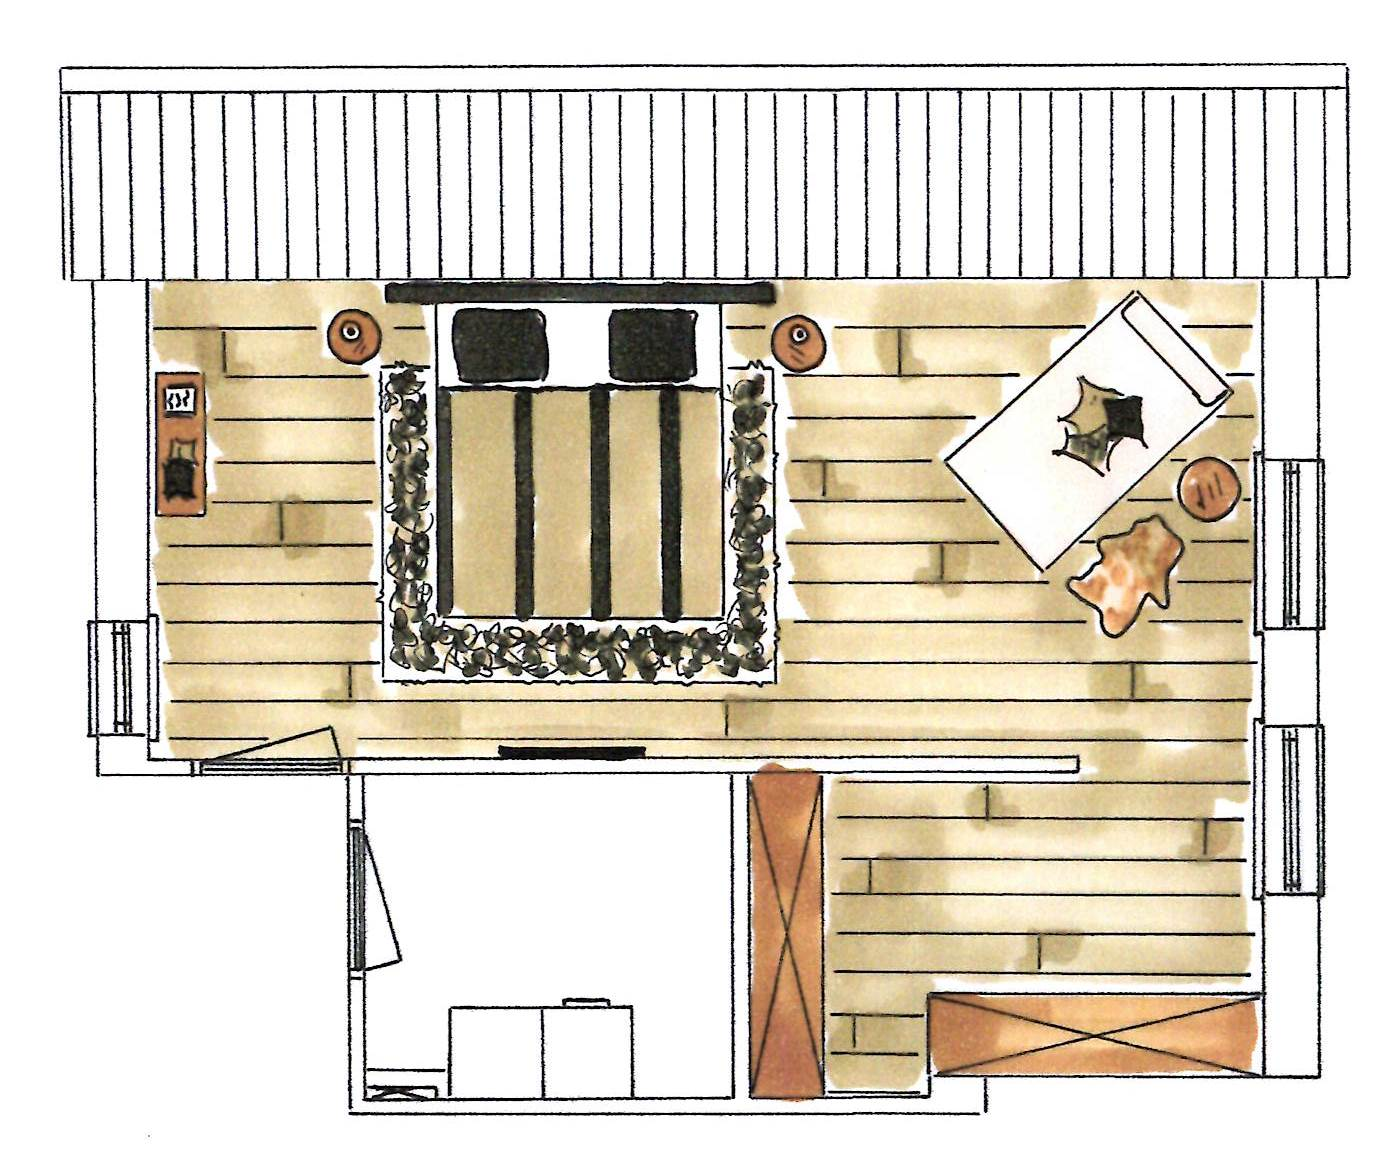 Interieurplan en verlichtingsplan interieurstylist - Plan ouderslaapkamer met badkamer en kleedkamer ...